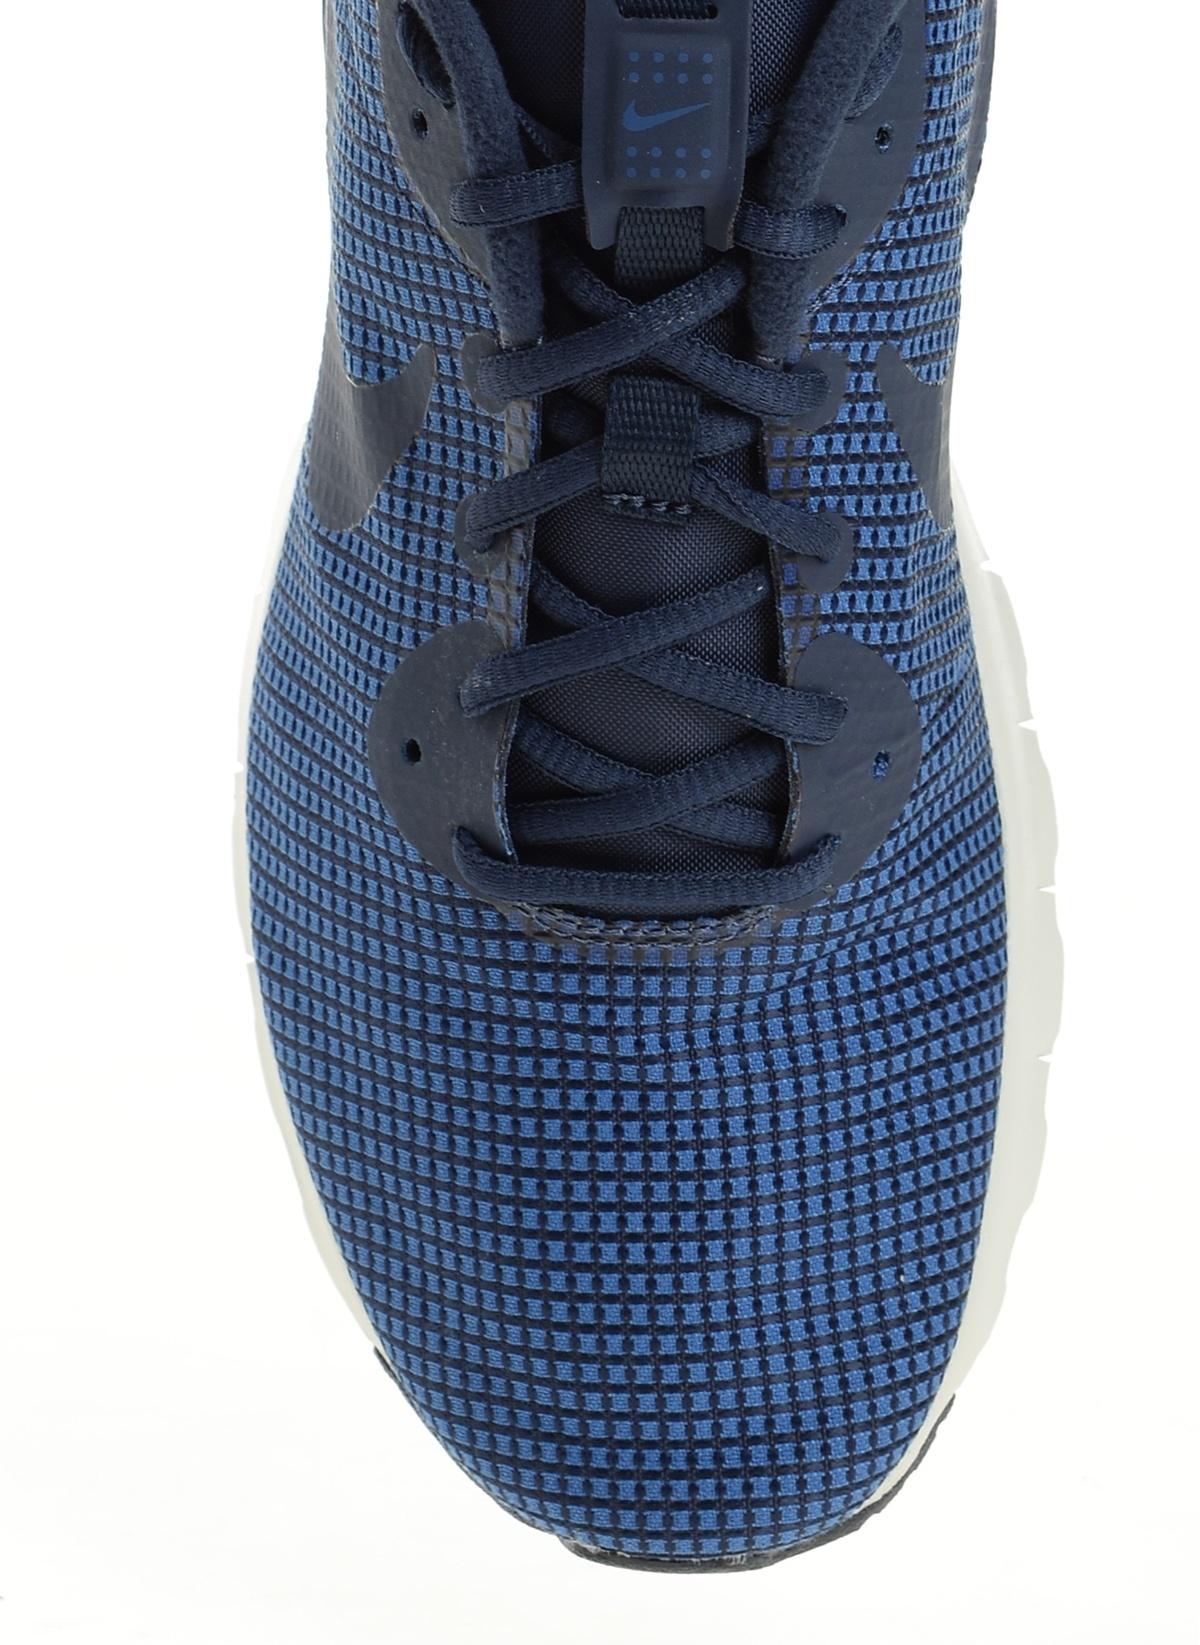 844836 402 Nike Air Max Motion Lw Se,ObsidianObsi